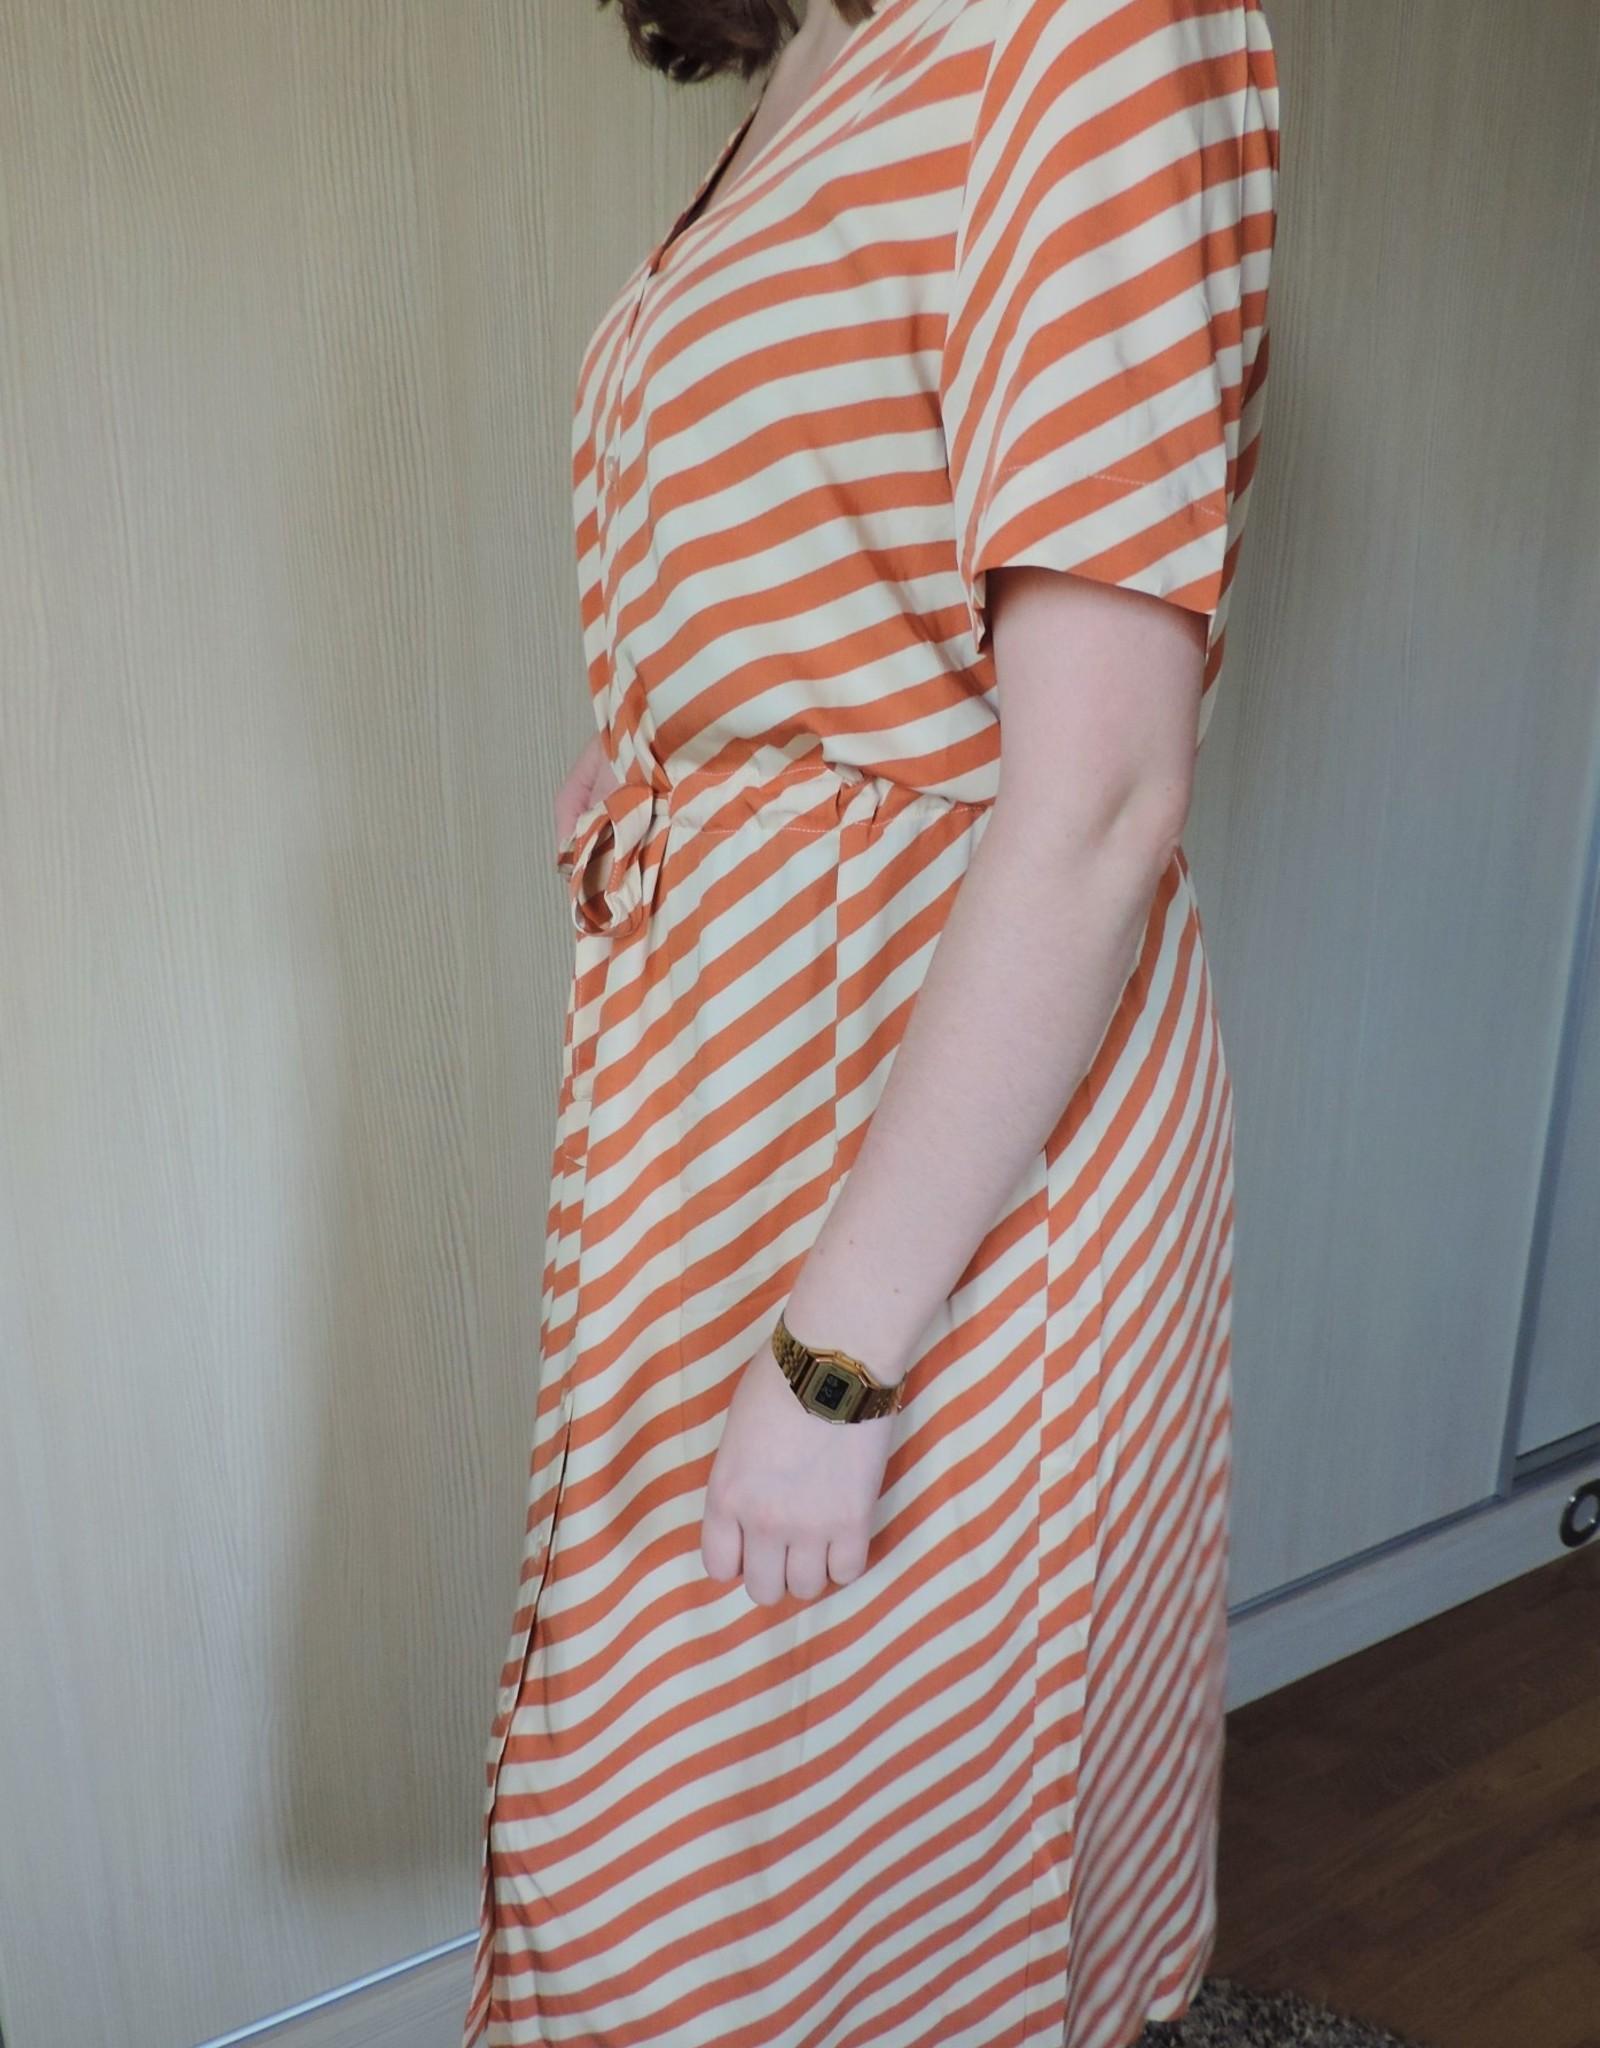 Maribelle dress